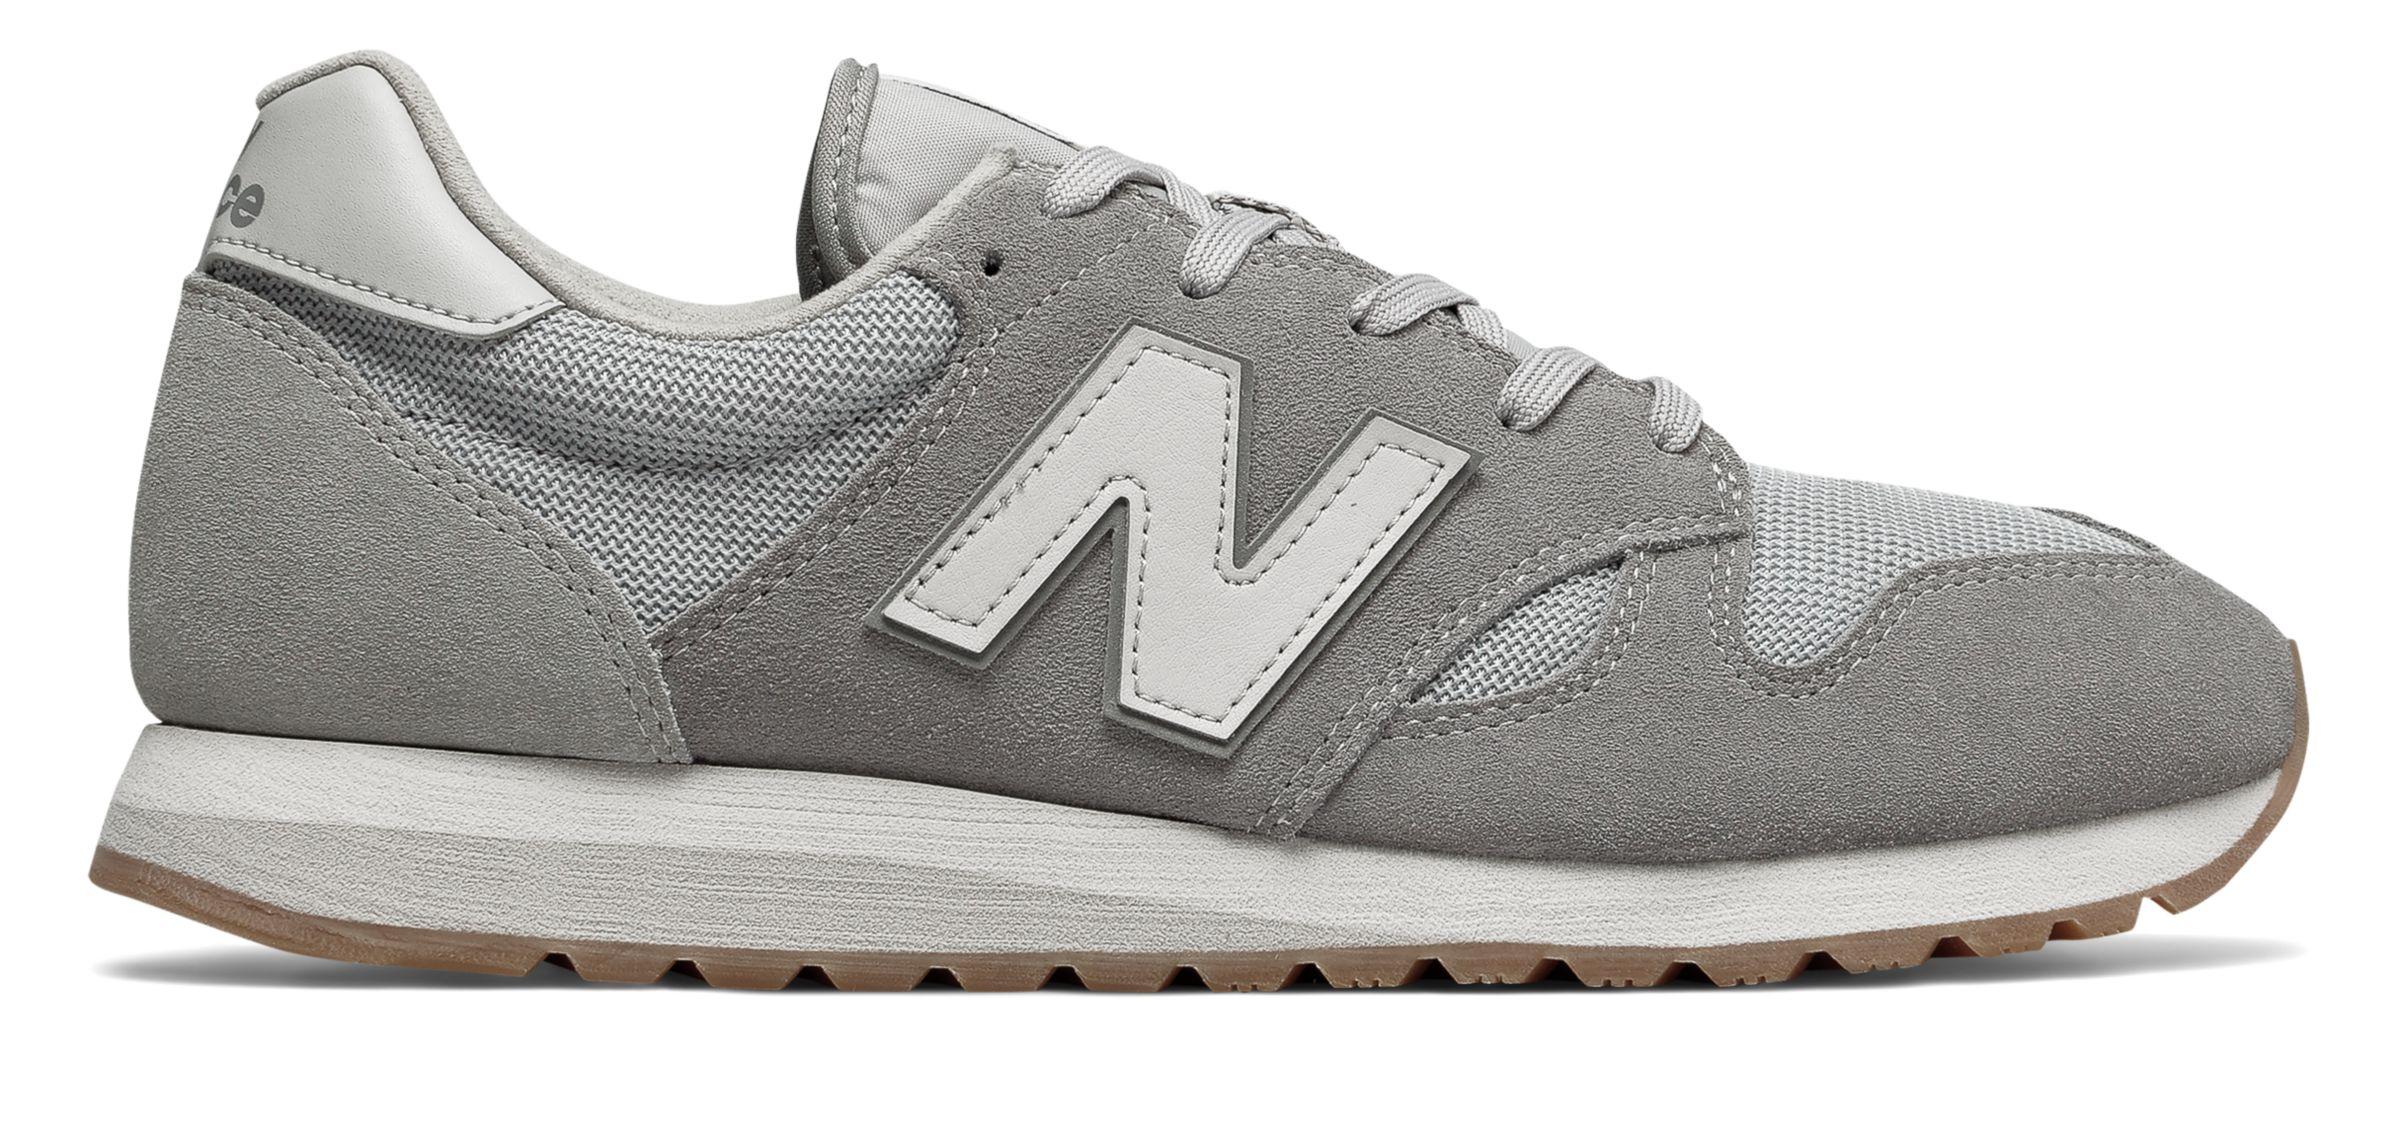 NB 520 New Balance, Cool Grey